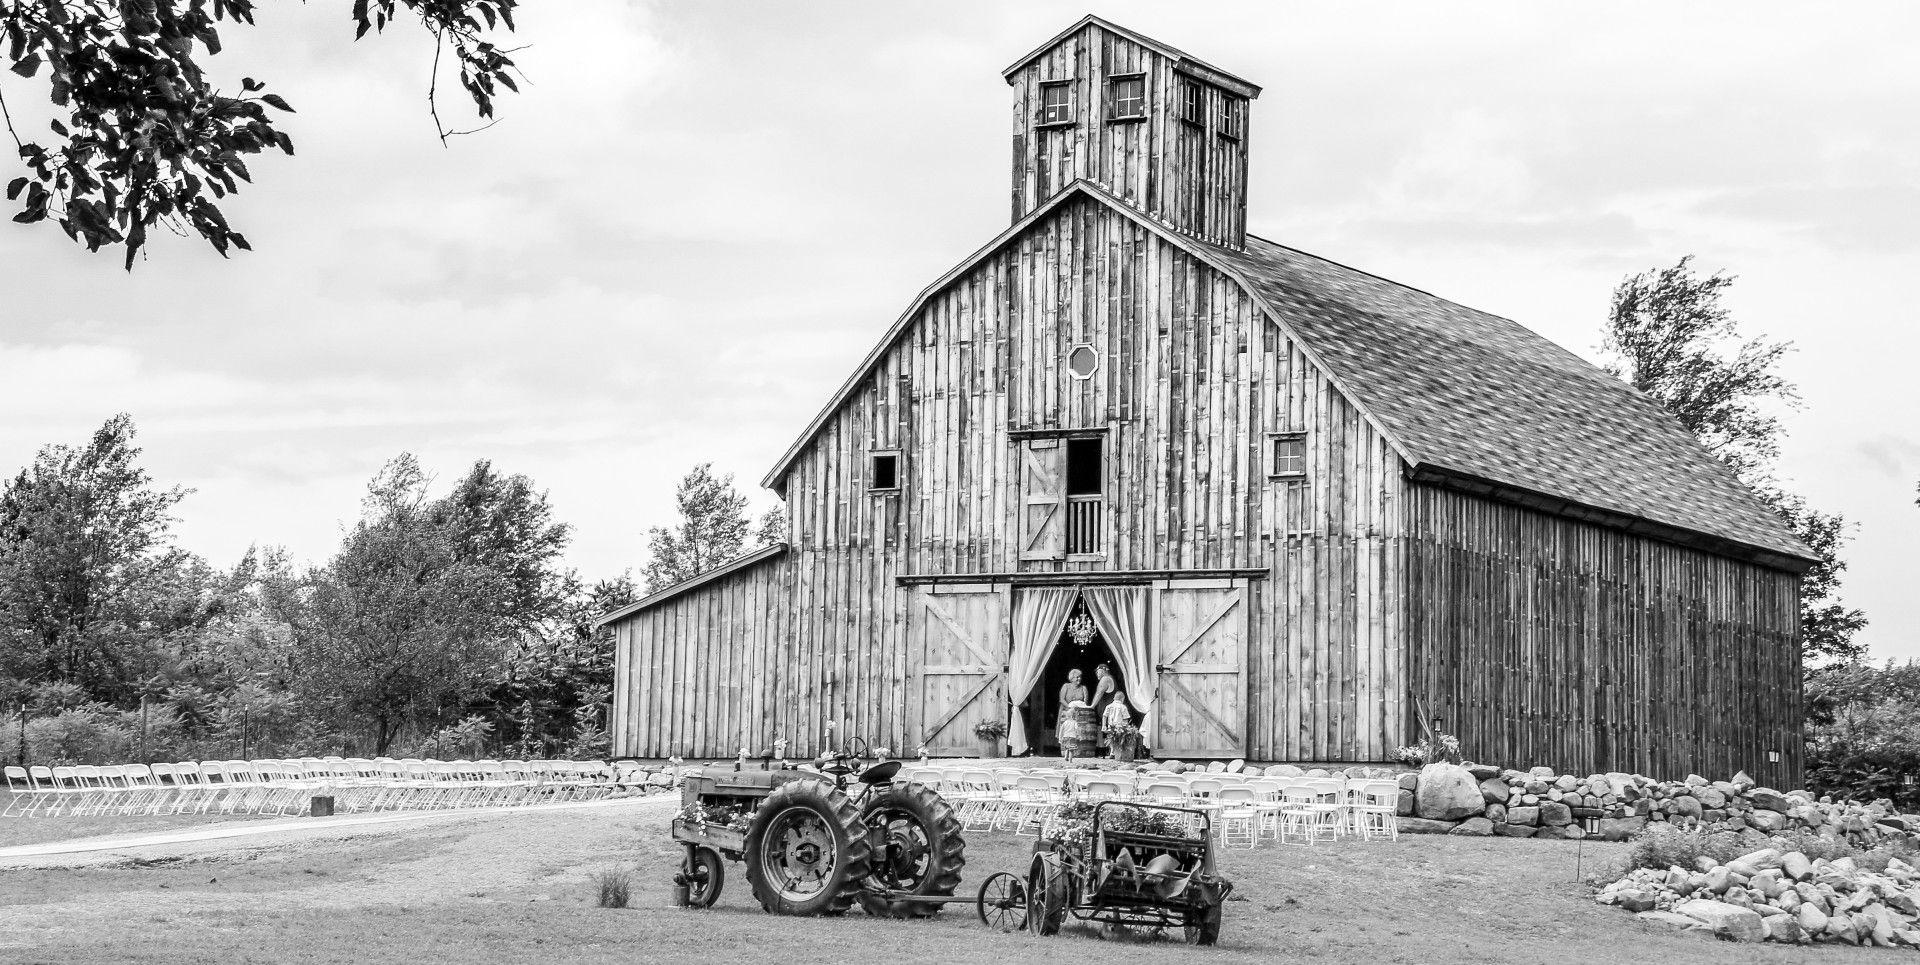 Rustic wedding barn located in Allen Michigan (Hillsdale